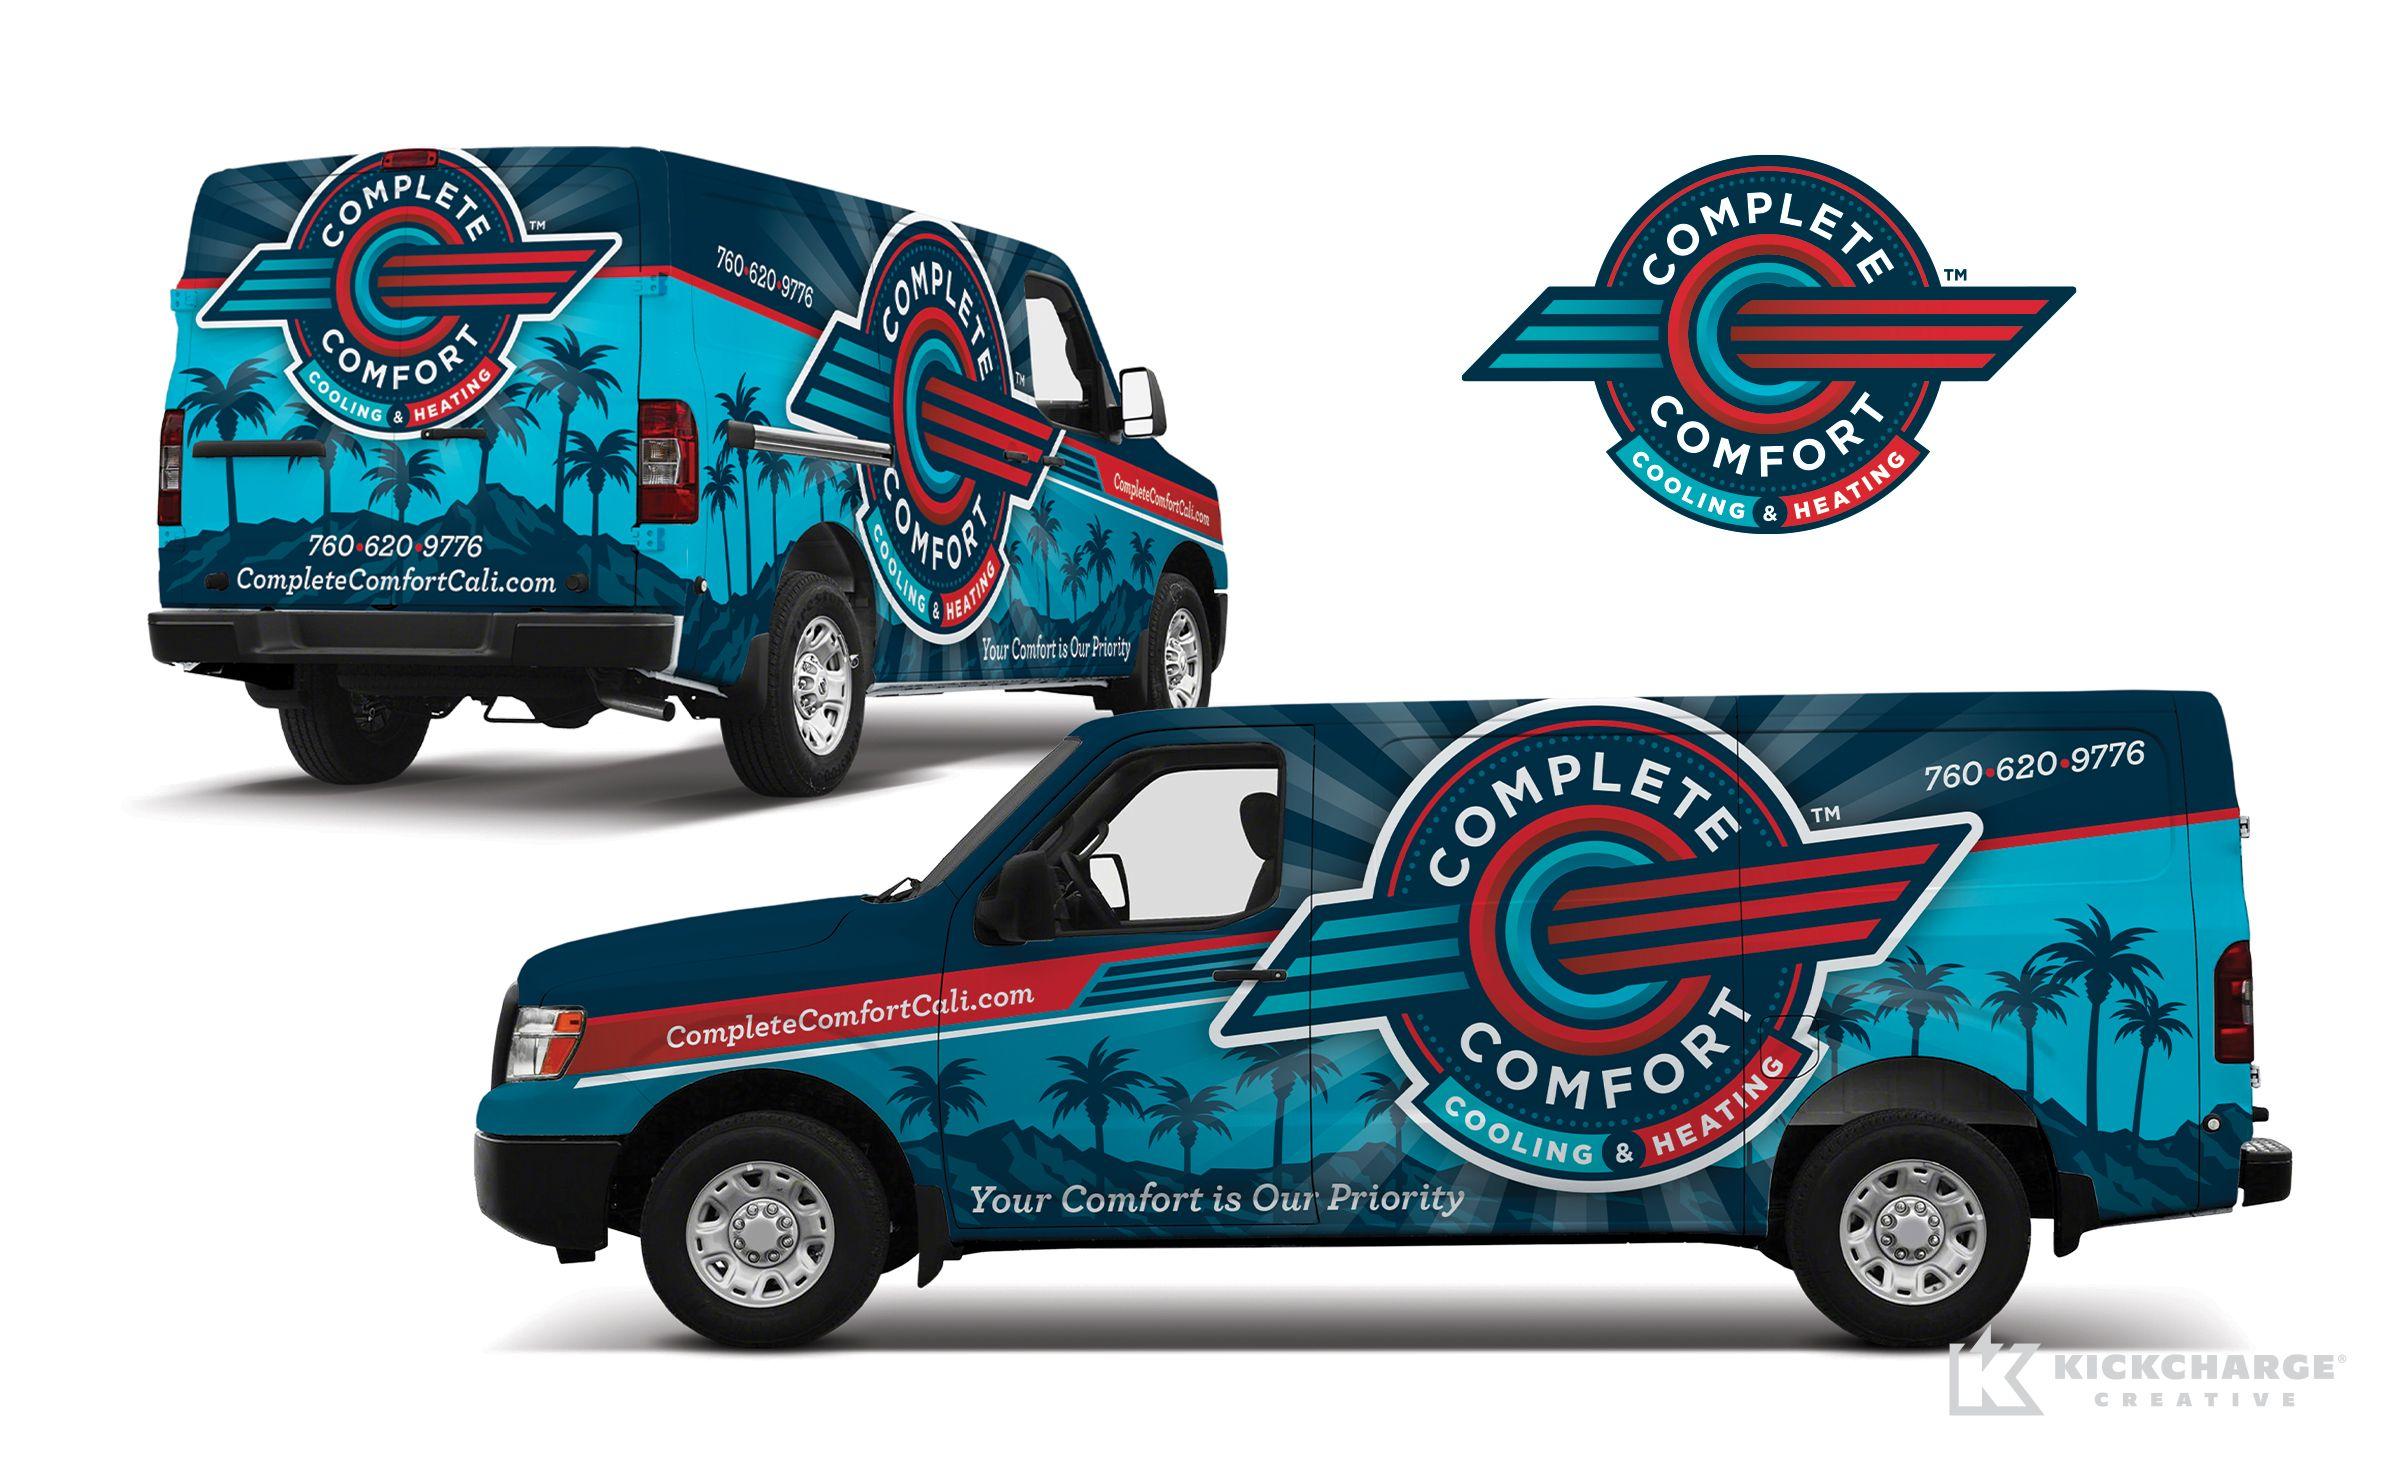 Vehicle Wrap Design For Complete Comfort Cooling Heating Nj